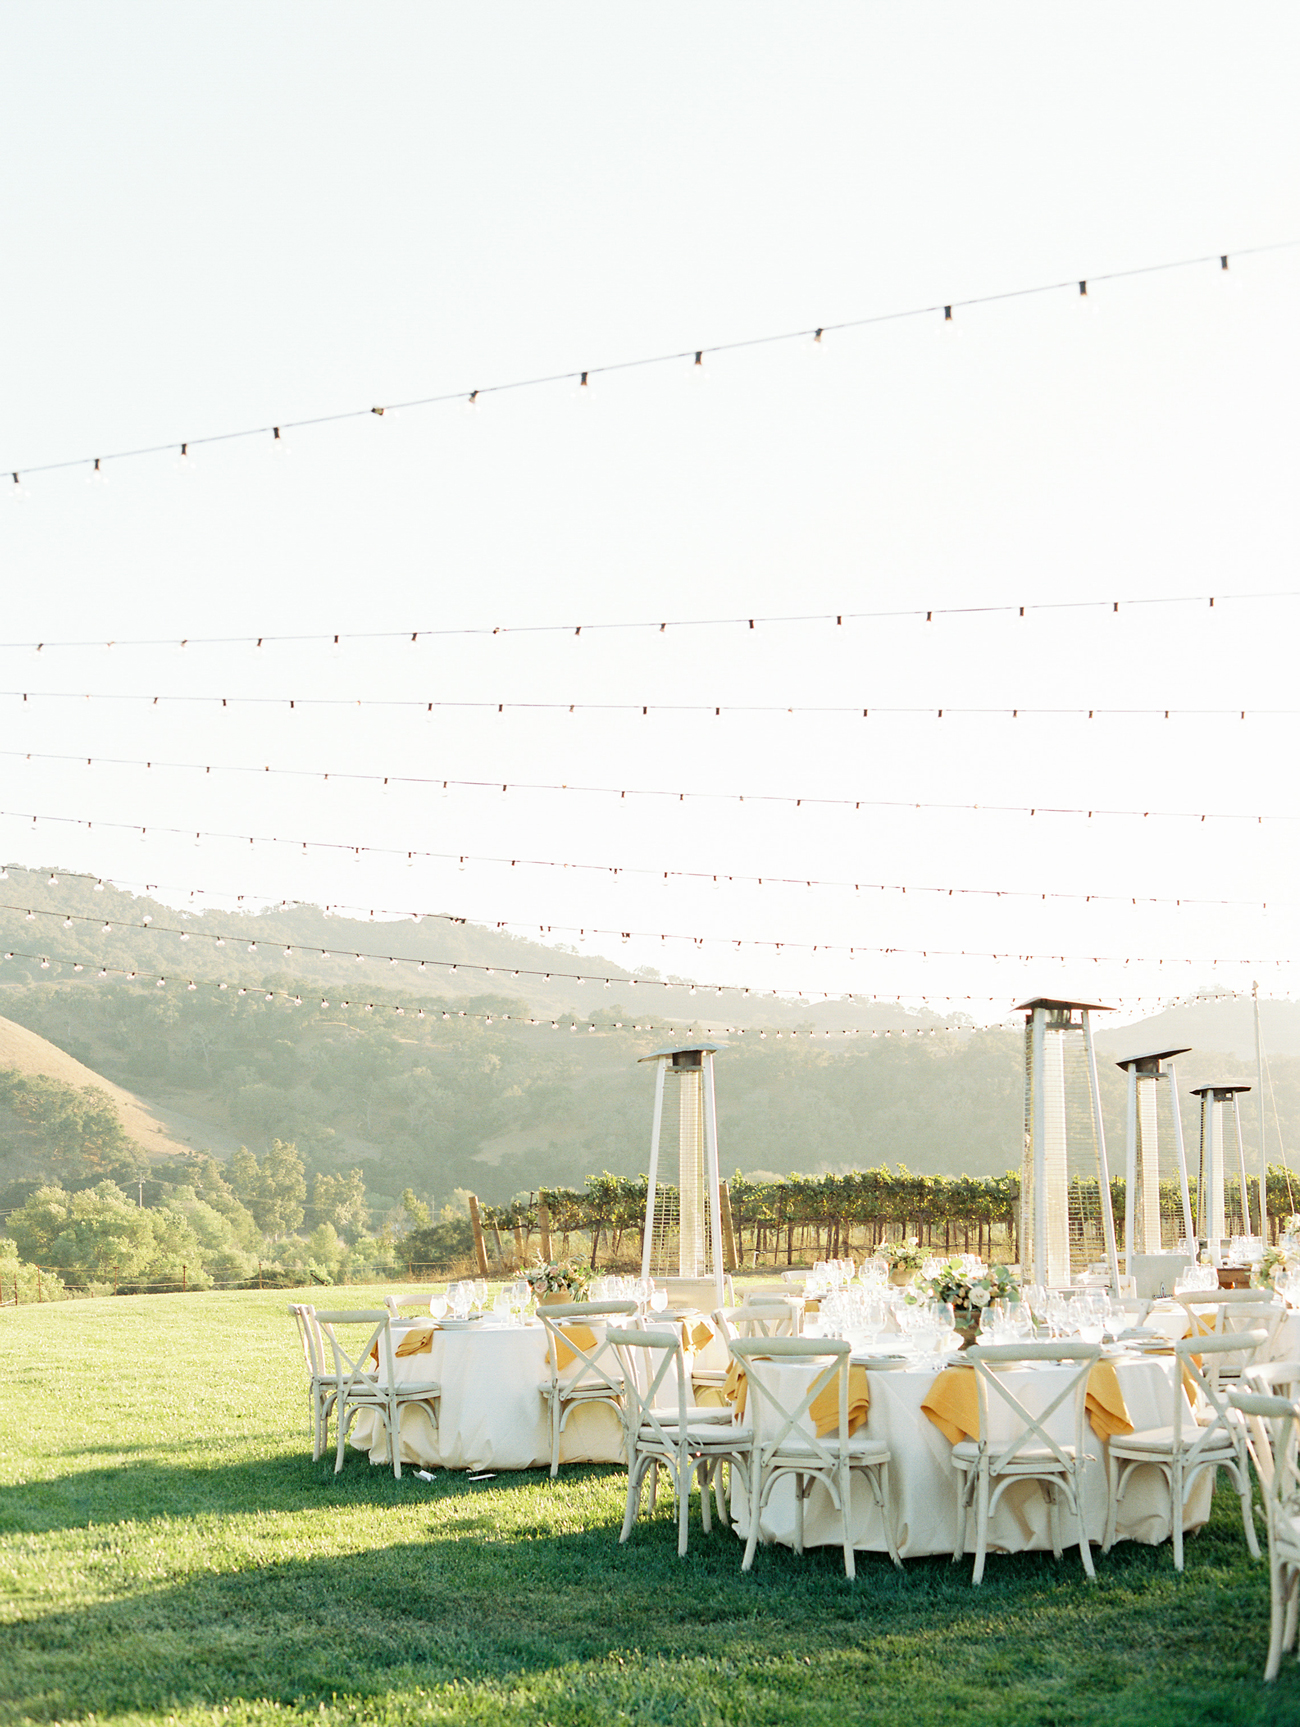 outdoor vineyard venue wedding reception under bistro lighting